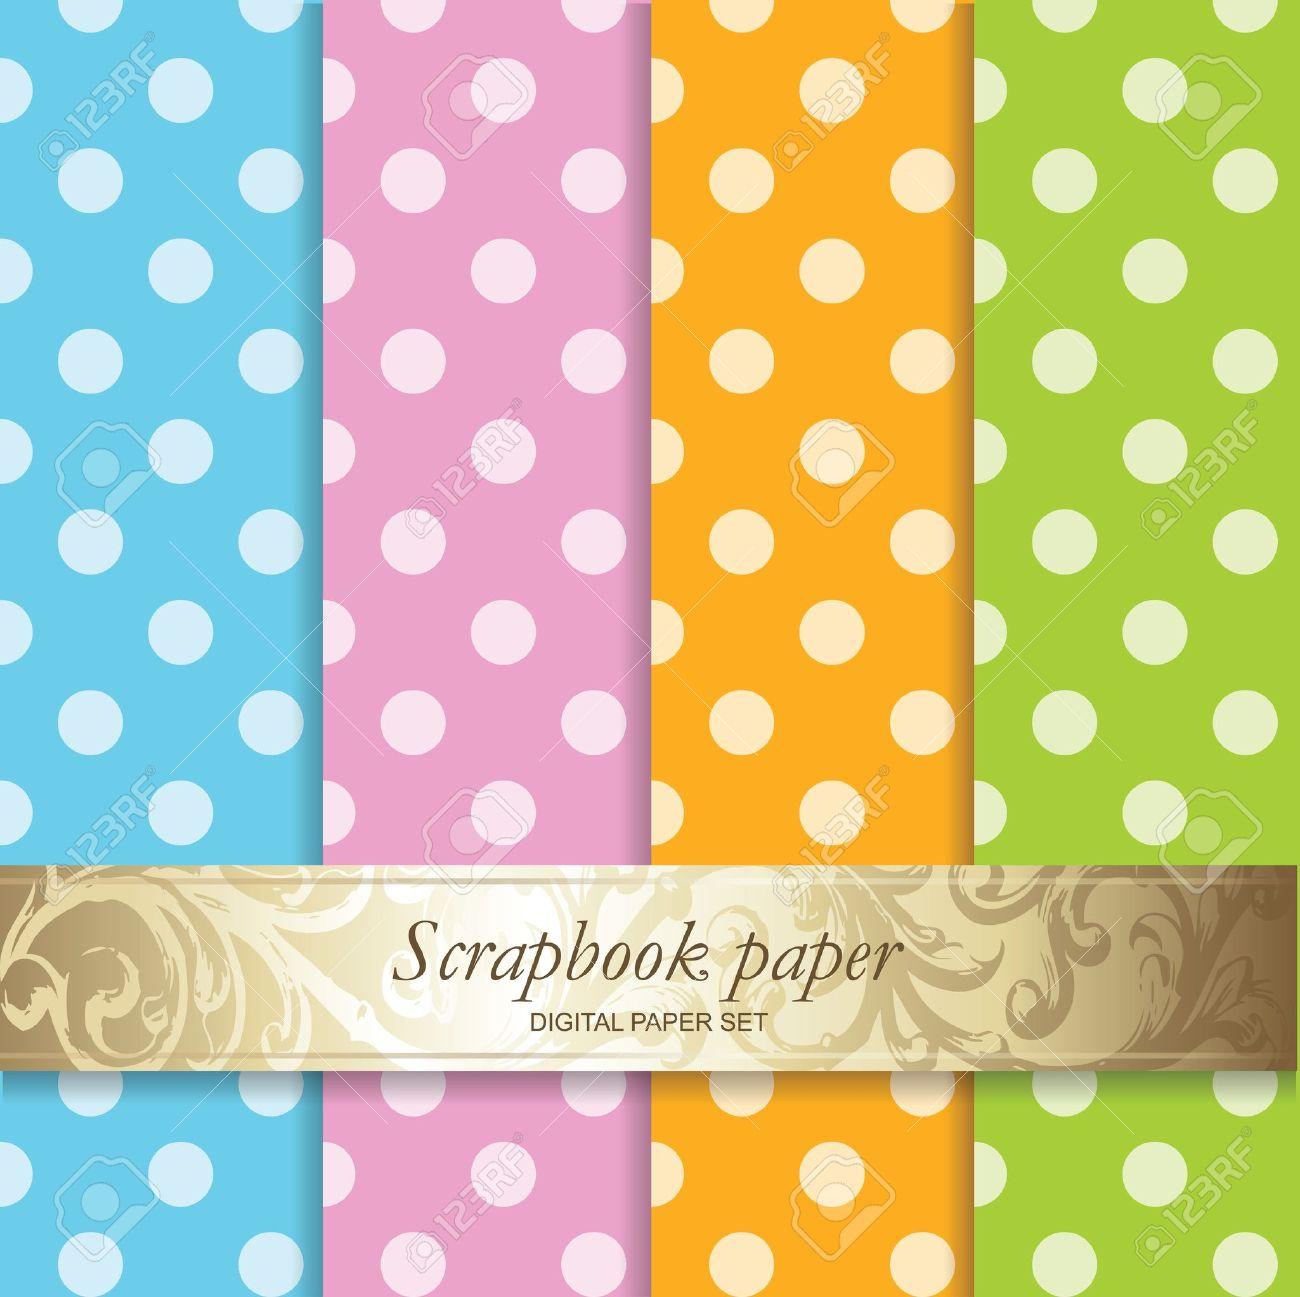 Colorful Backgrounds set - Scrapbook paper Stock Vector - 15428131